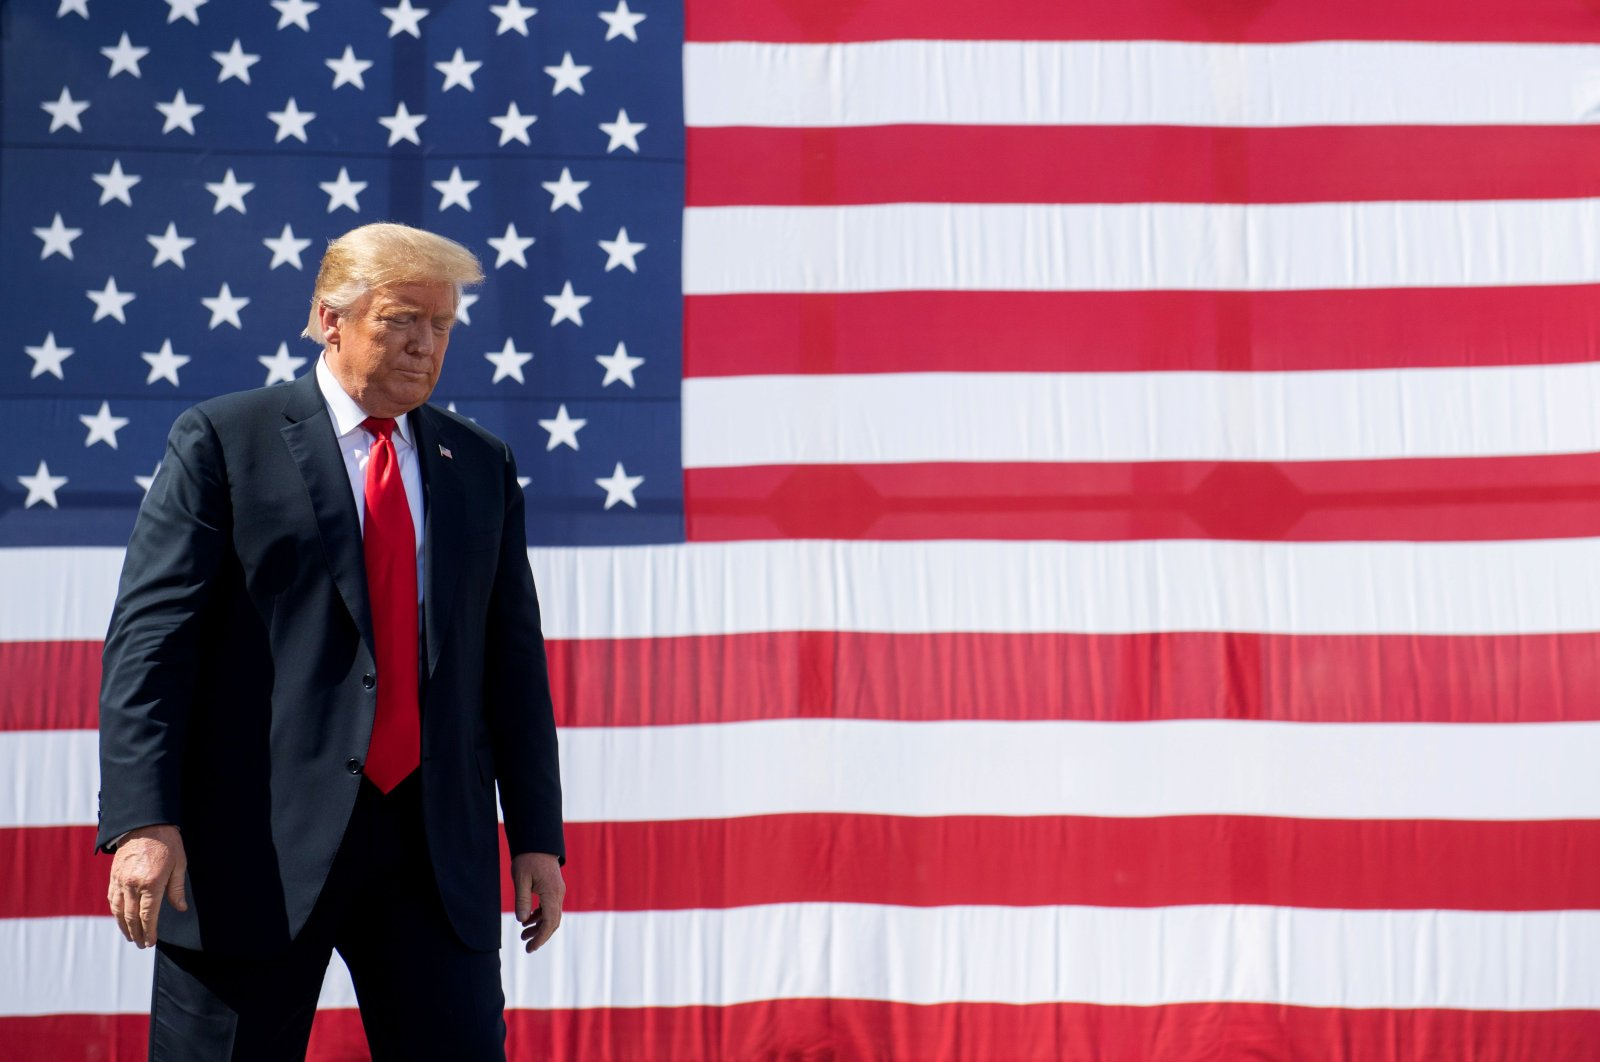 U.S. President Donald Trump gestures following a tour of Fincantieri Marinette Marine in Marinette, Wisconsin, June 25, 2020. (AFP Photo)